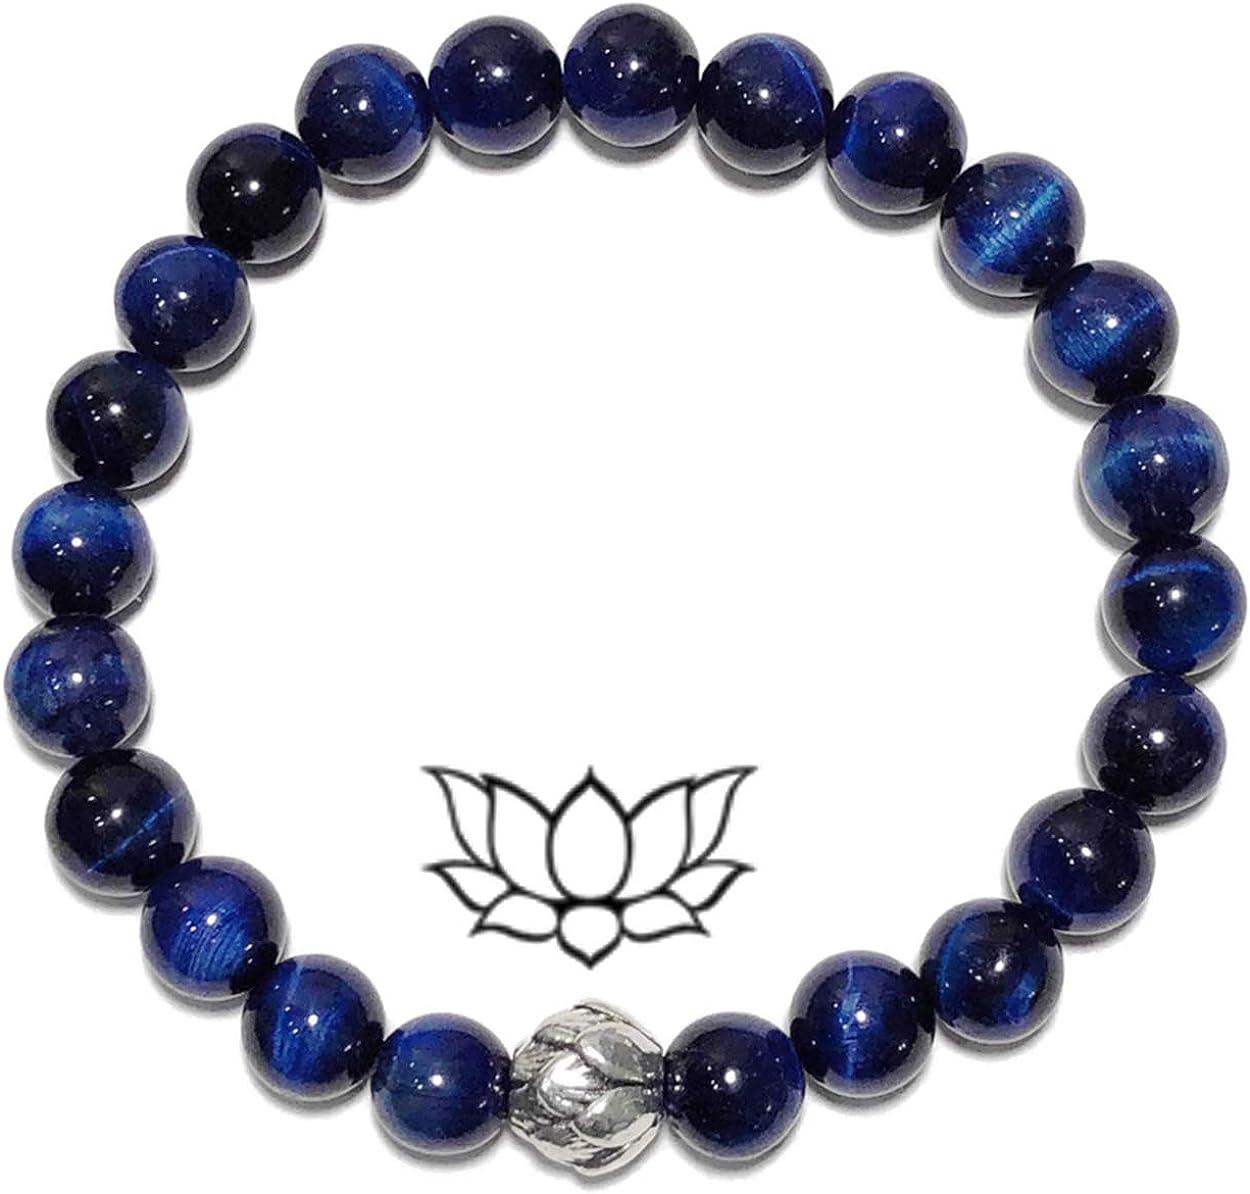 BLUE TIGER EYE | Silver LOTUS Bracelet | PERSEVERANCE | Meditation Self-Care Wellness Wristband | Yoga Bead Mala | Chakra Reiki Energy Zen Jewelry